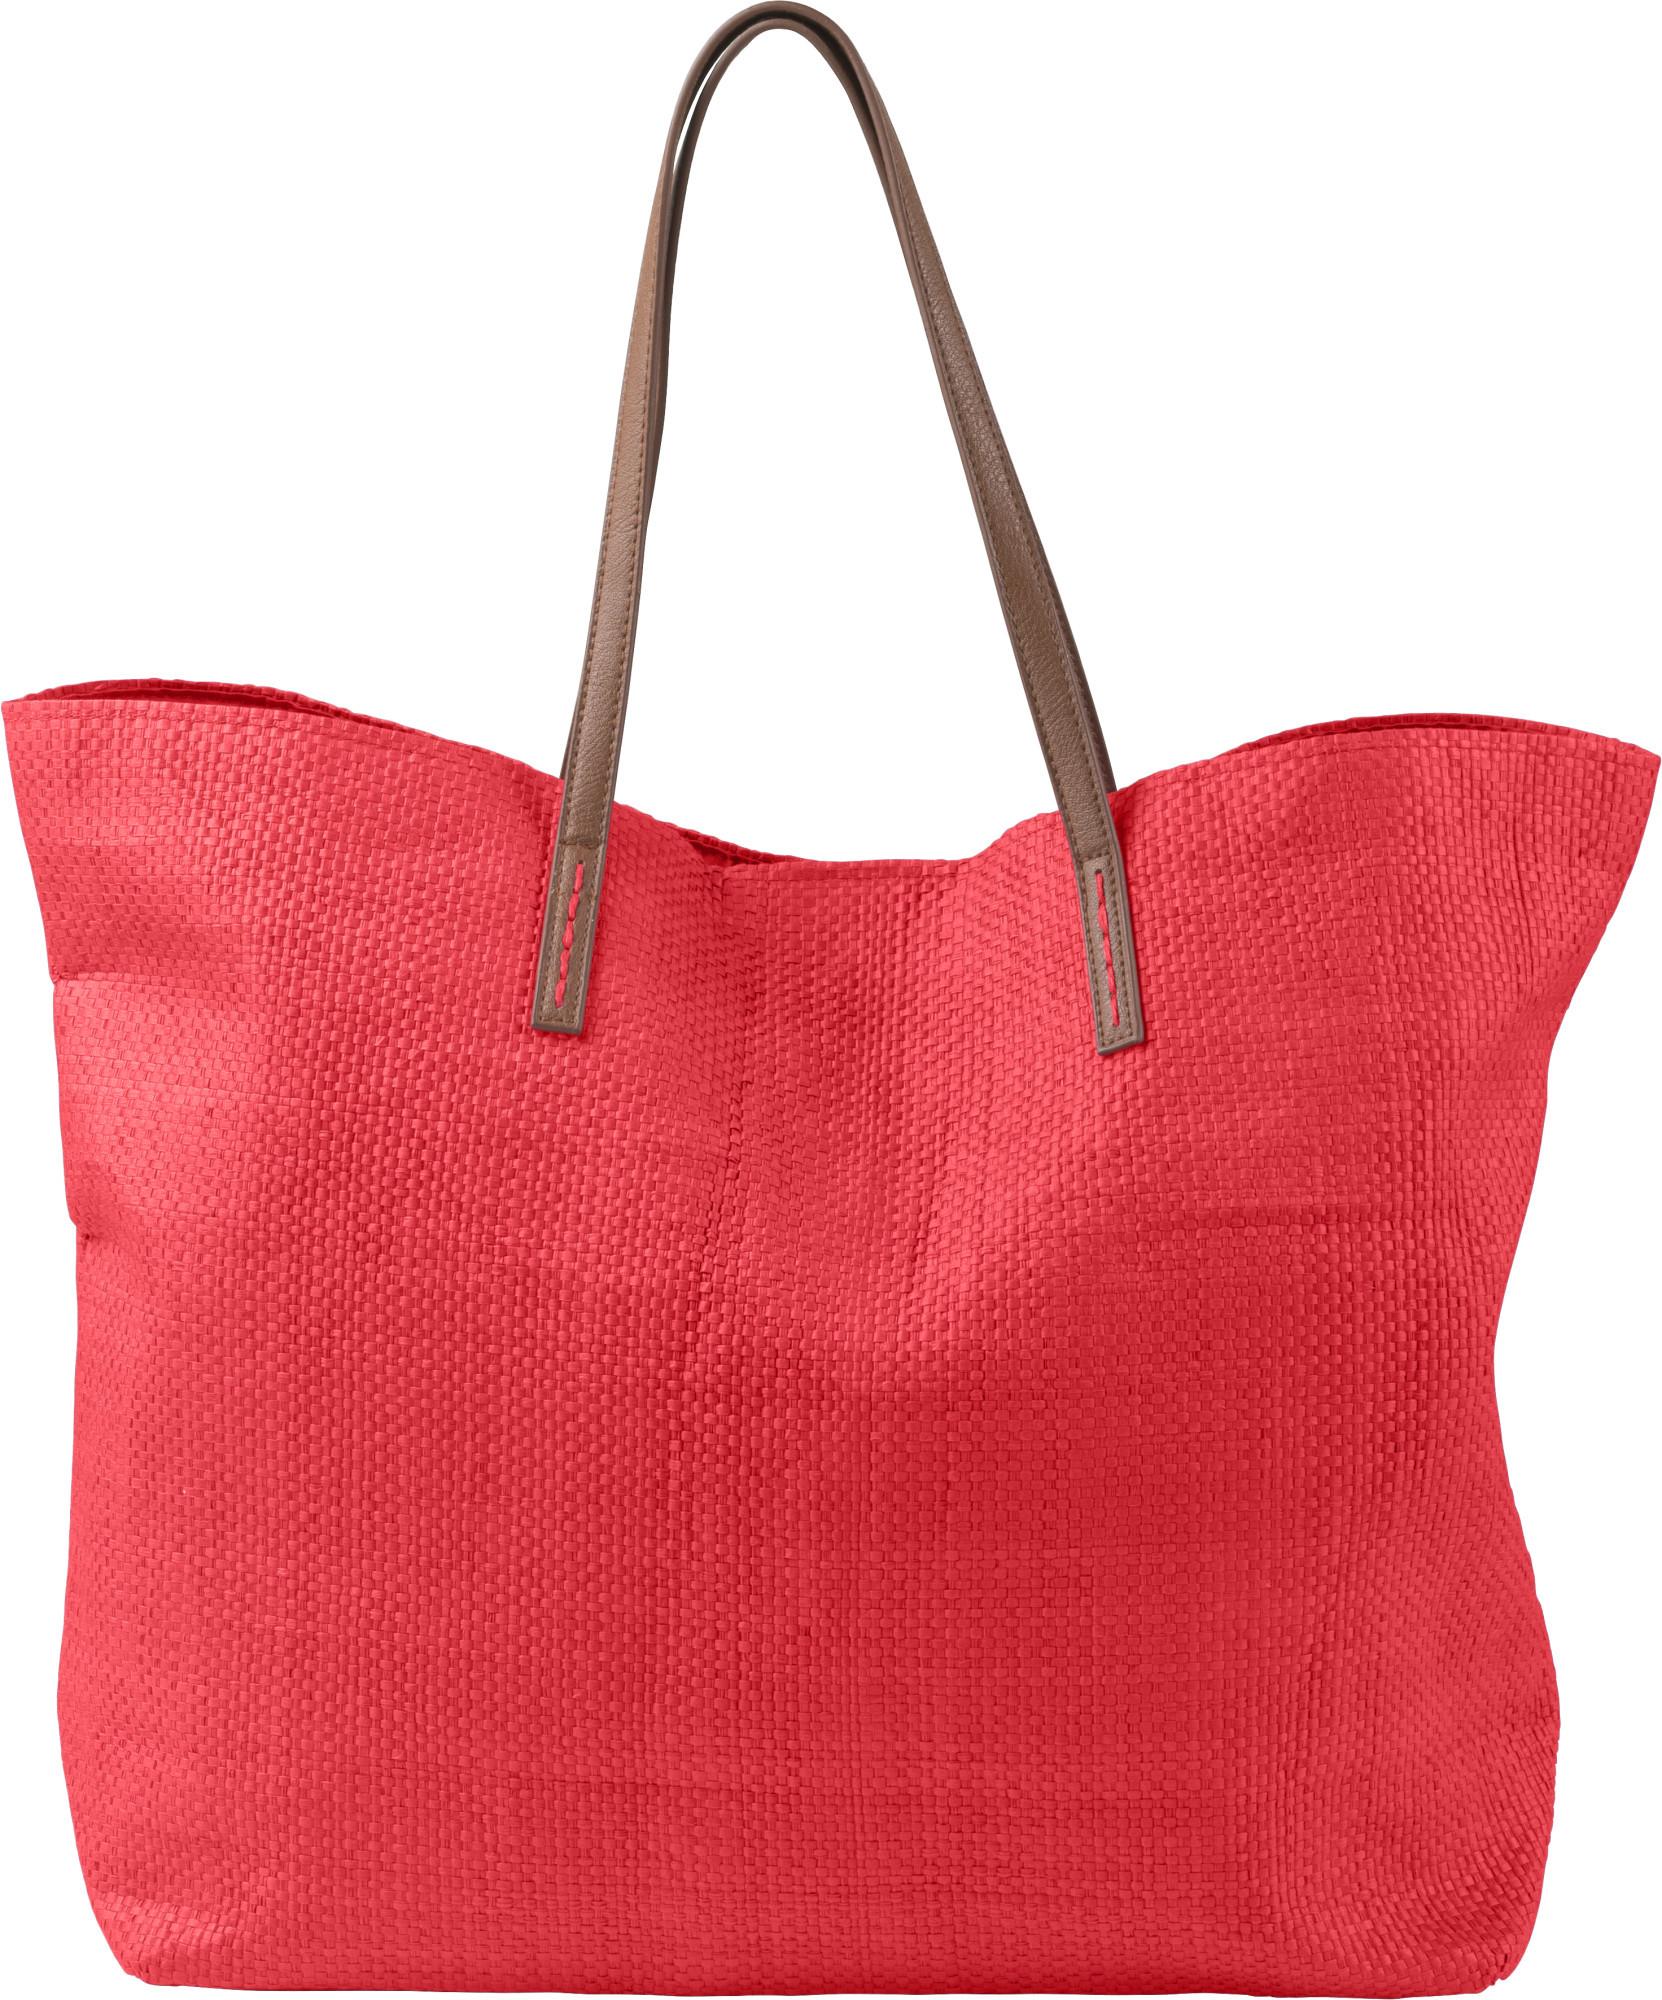 Sac shopping et plage en polyester - 19-1249-21